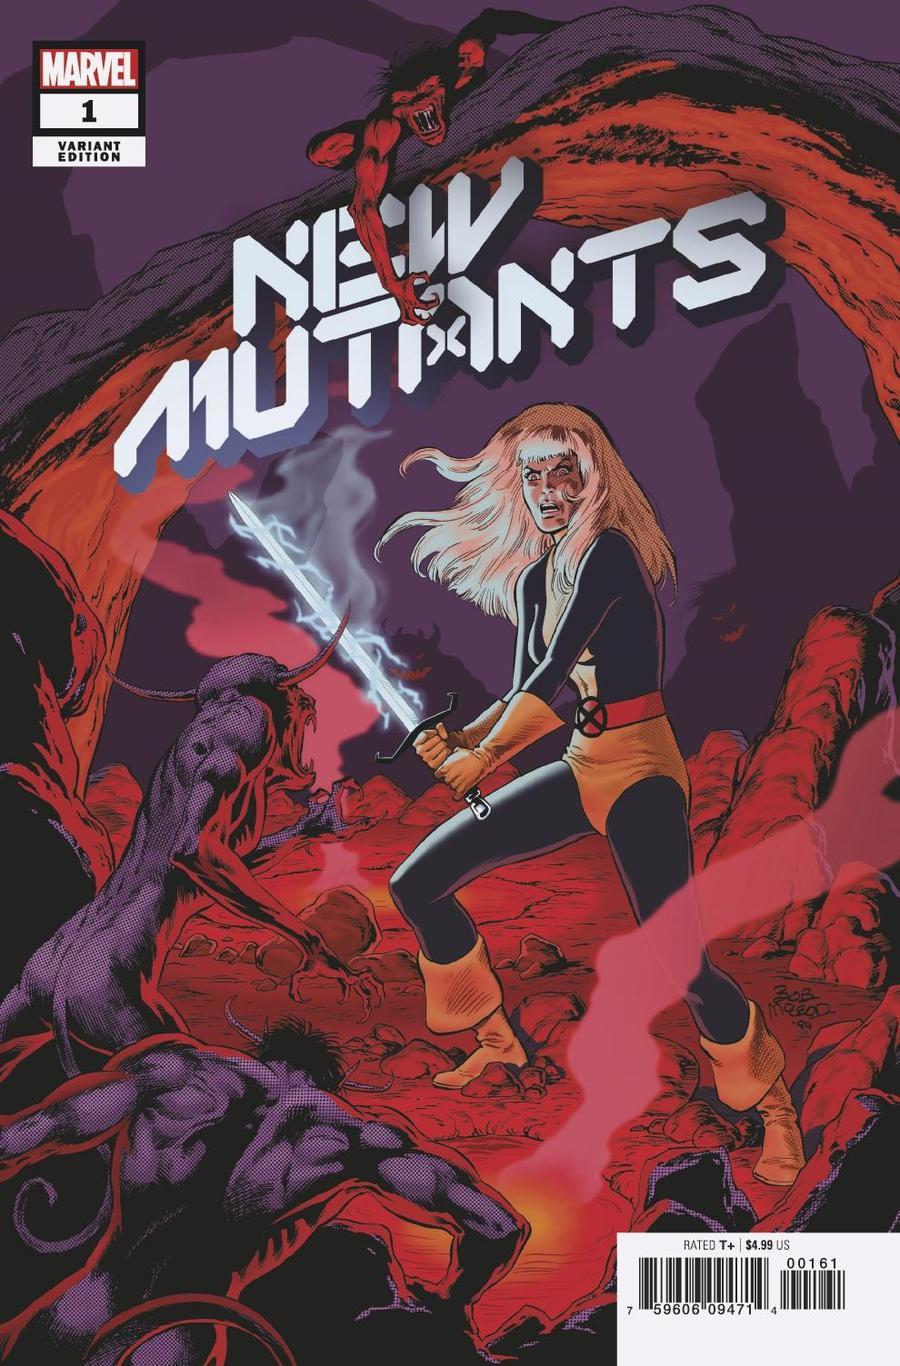 New Mutants Vol 4 #1 Cover H Incentive Bob McLeod Hidden Gem Variant Cover (Dawn Of X Tie-In)